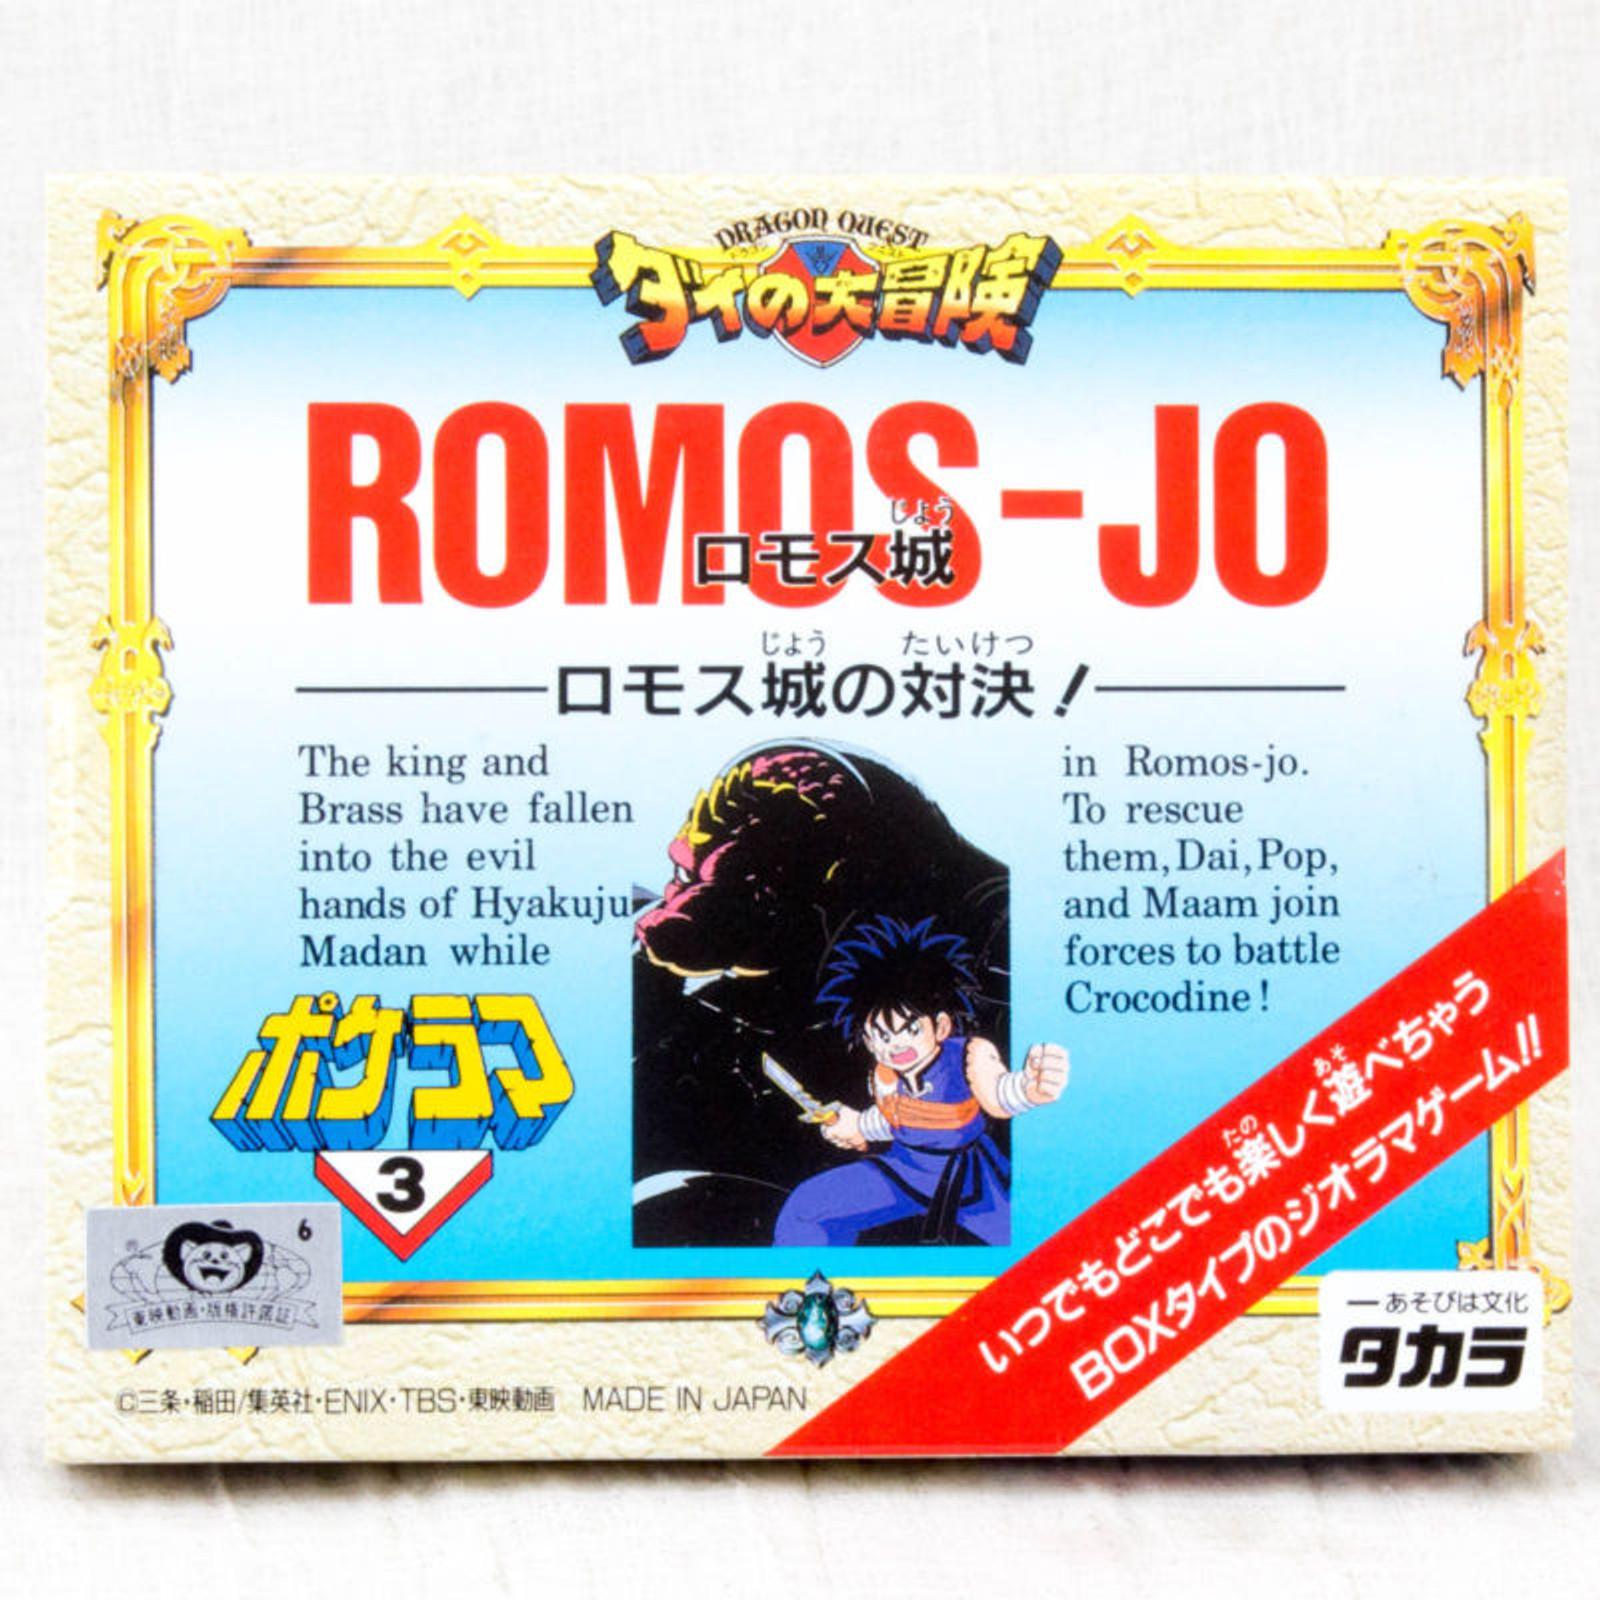 Dragon Quest: The Adventure of Dai Pokerama #3 Romos-Jo Mini Diorama Figure TAKARA